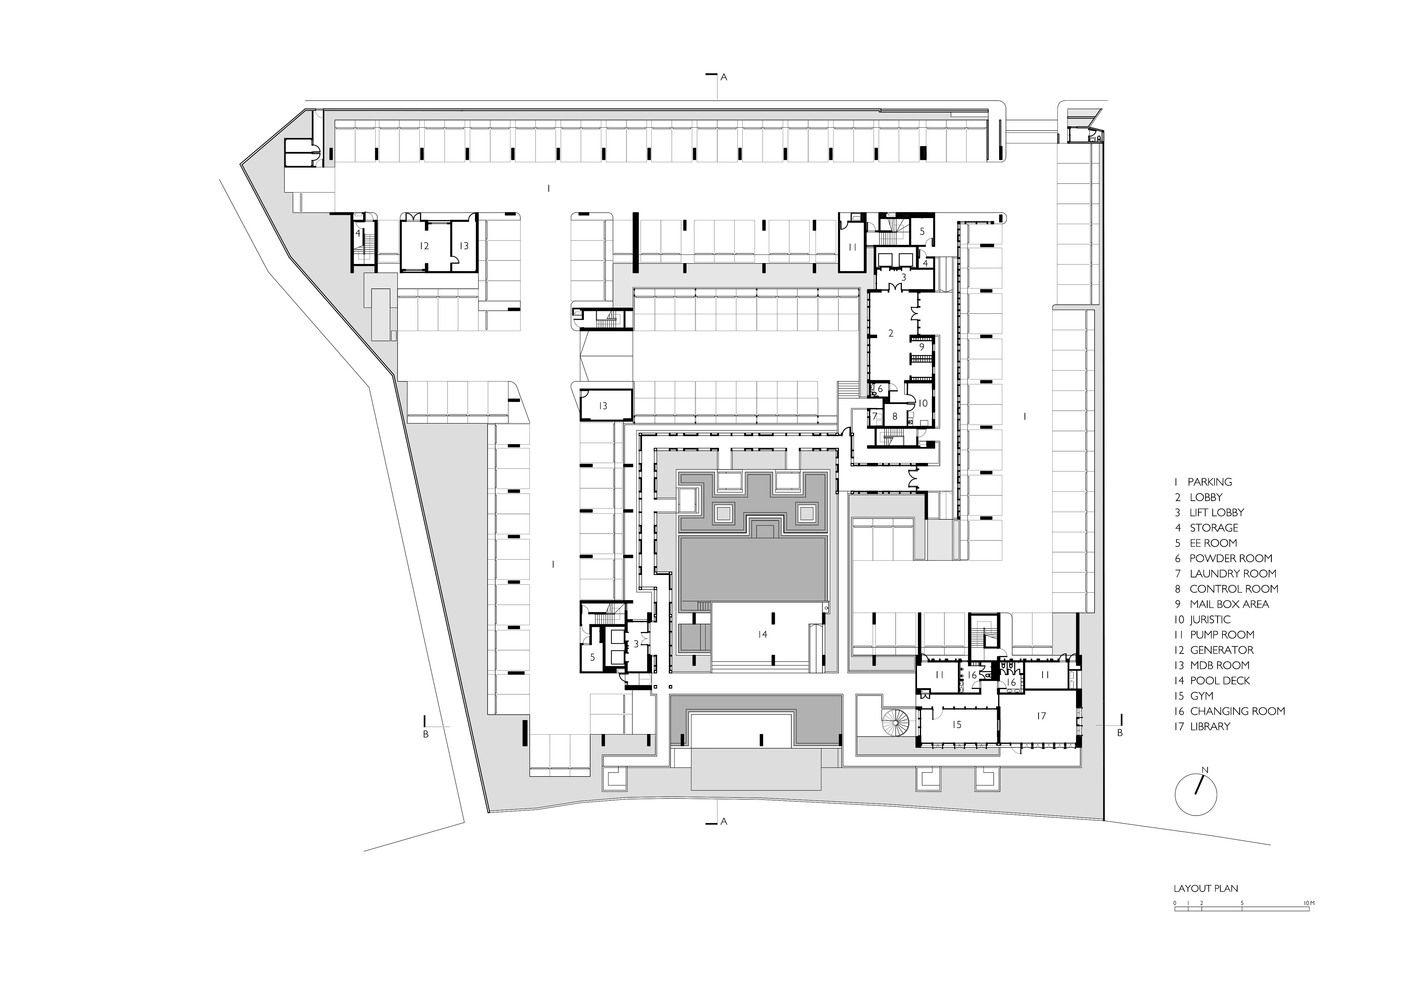 Gallery Of Hasu Haus / Somdoon Architects   15